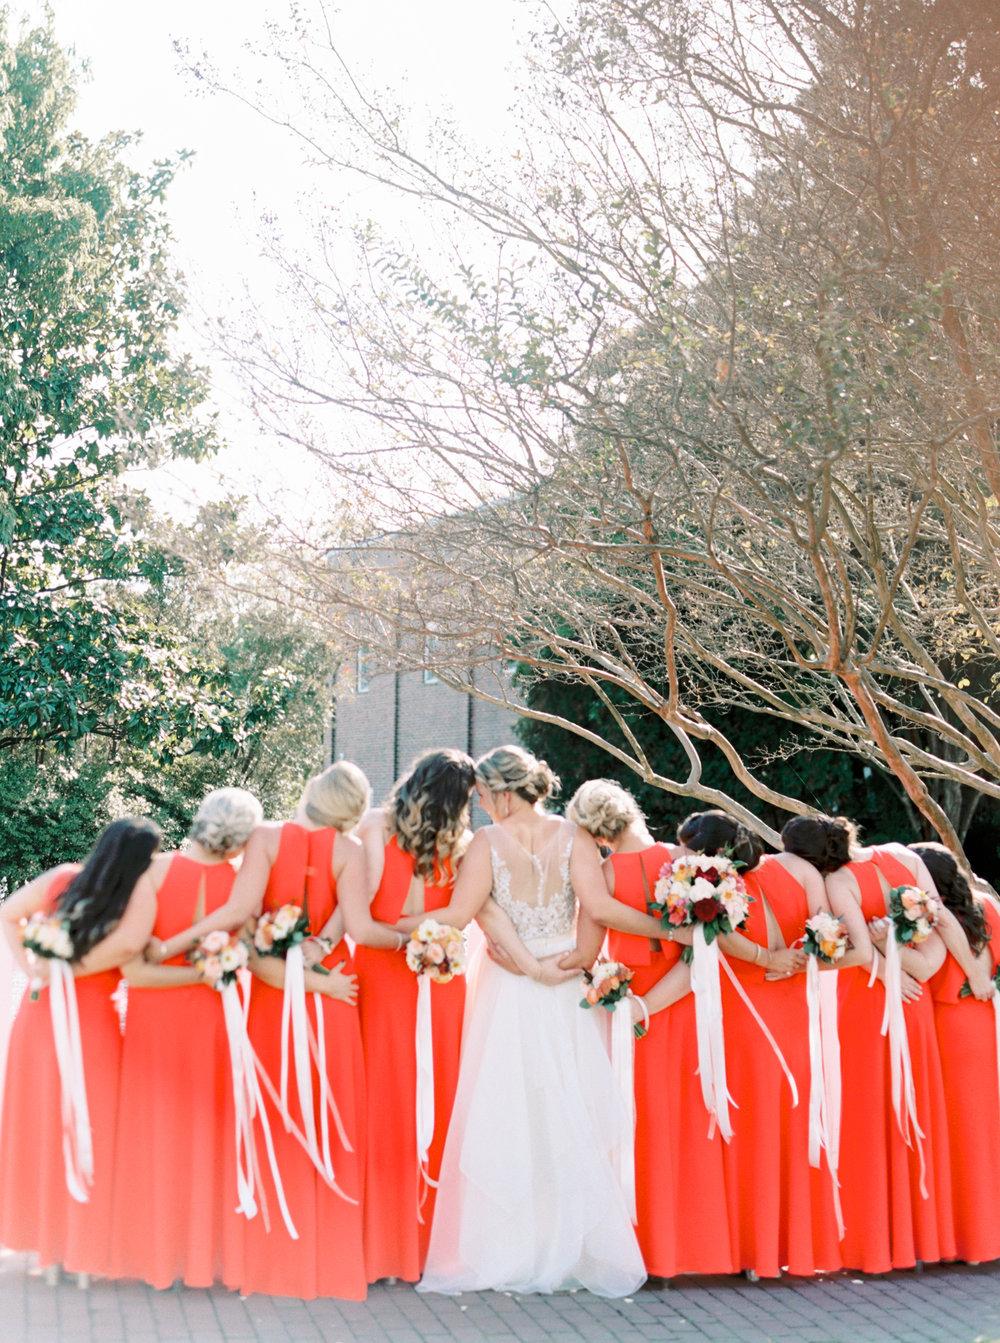 Easton_Maryland-fall-backyard-wedding-photographer-Richmond-natalie-jayne-photography-image-14.jpg